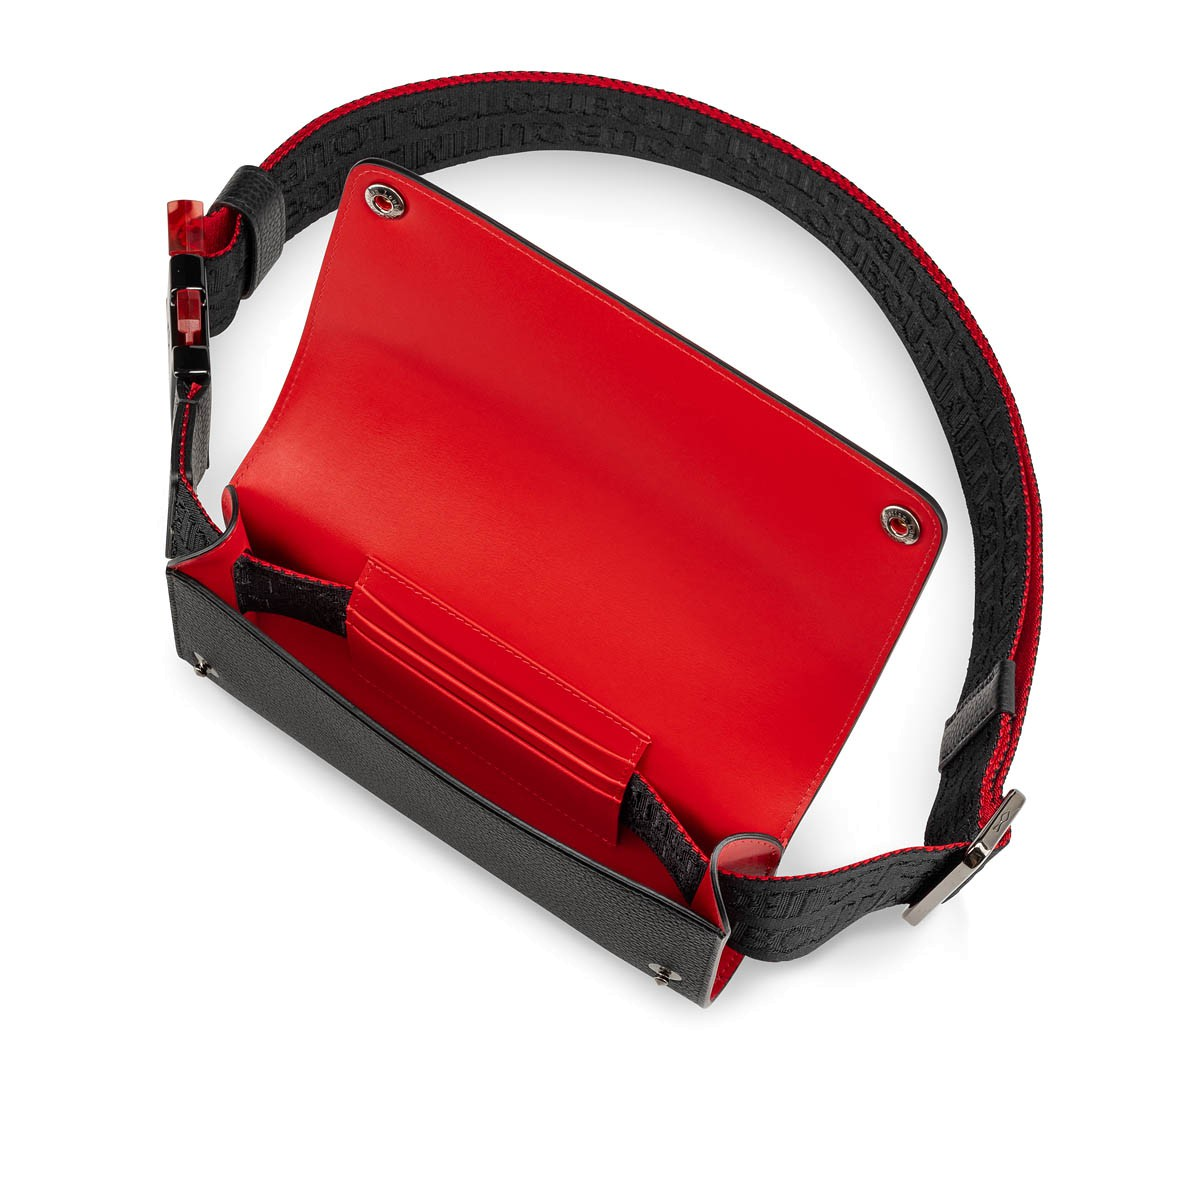 Small Leather Goods - Loubiclic Body Bag - Christian Louboutin